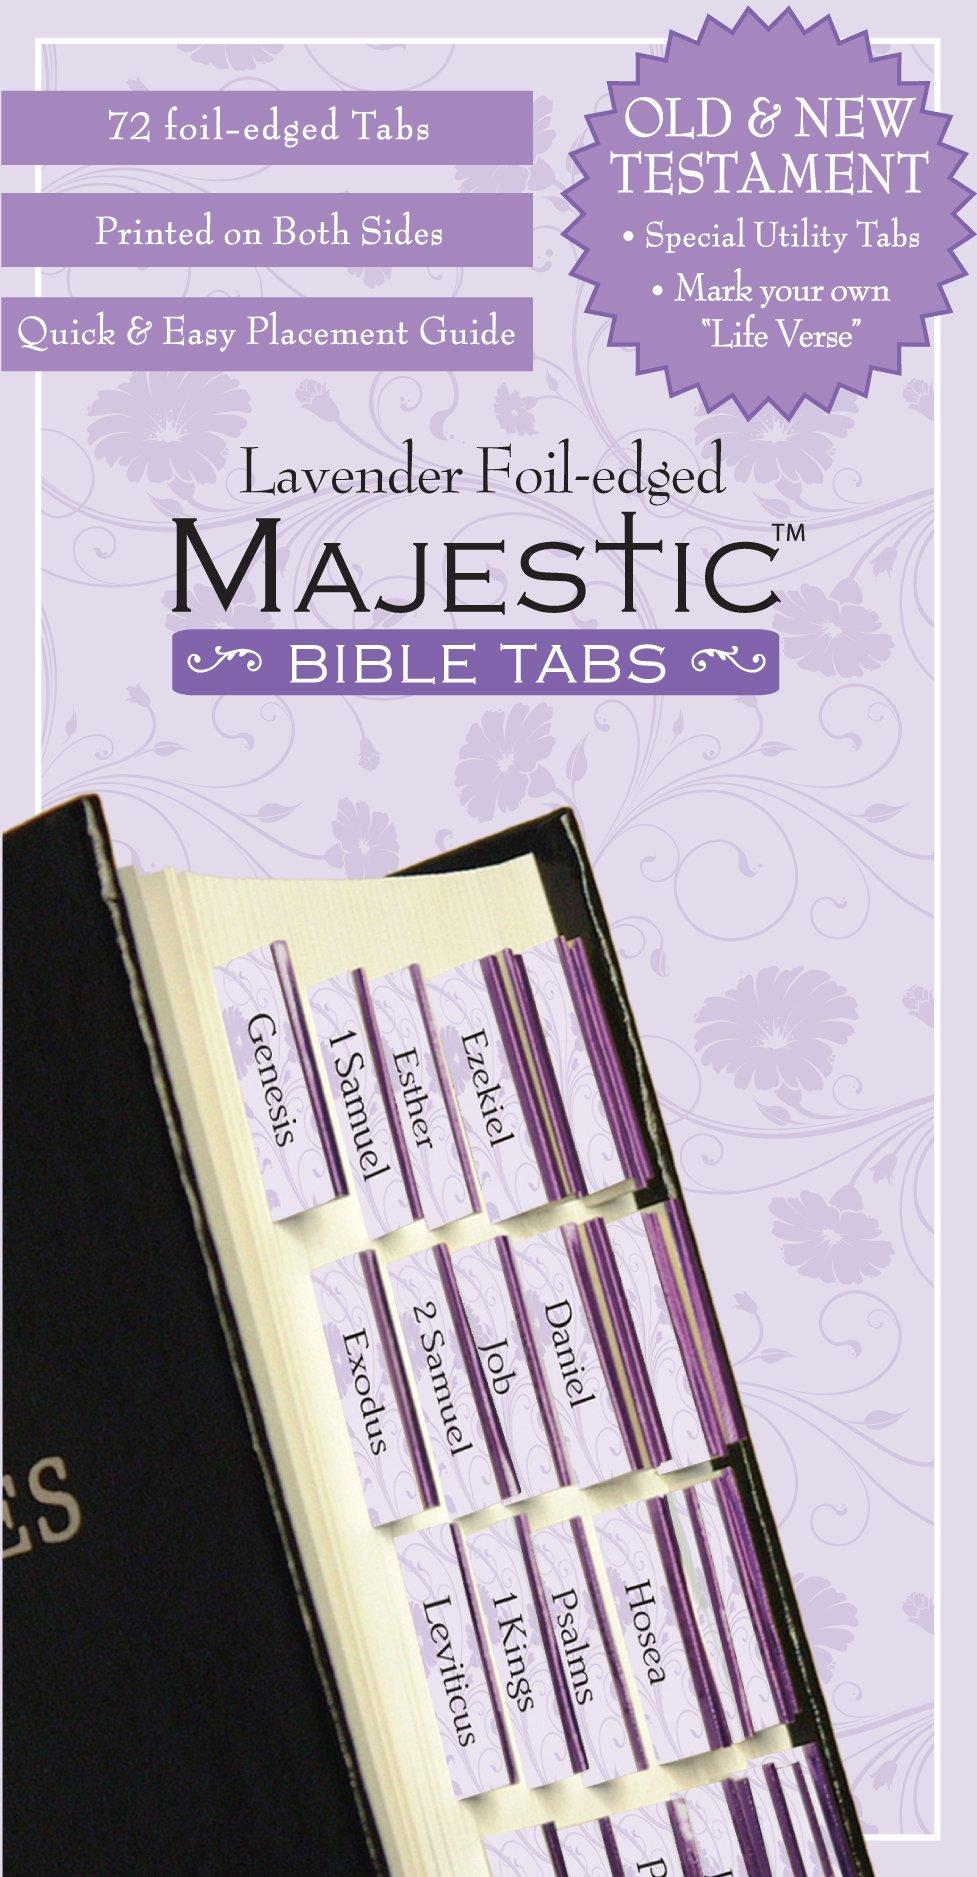 Majestic Bible Tabs Lavender